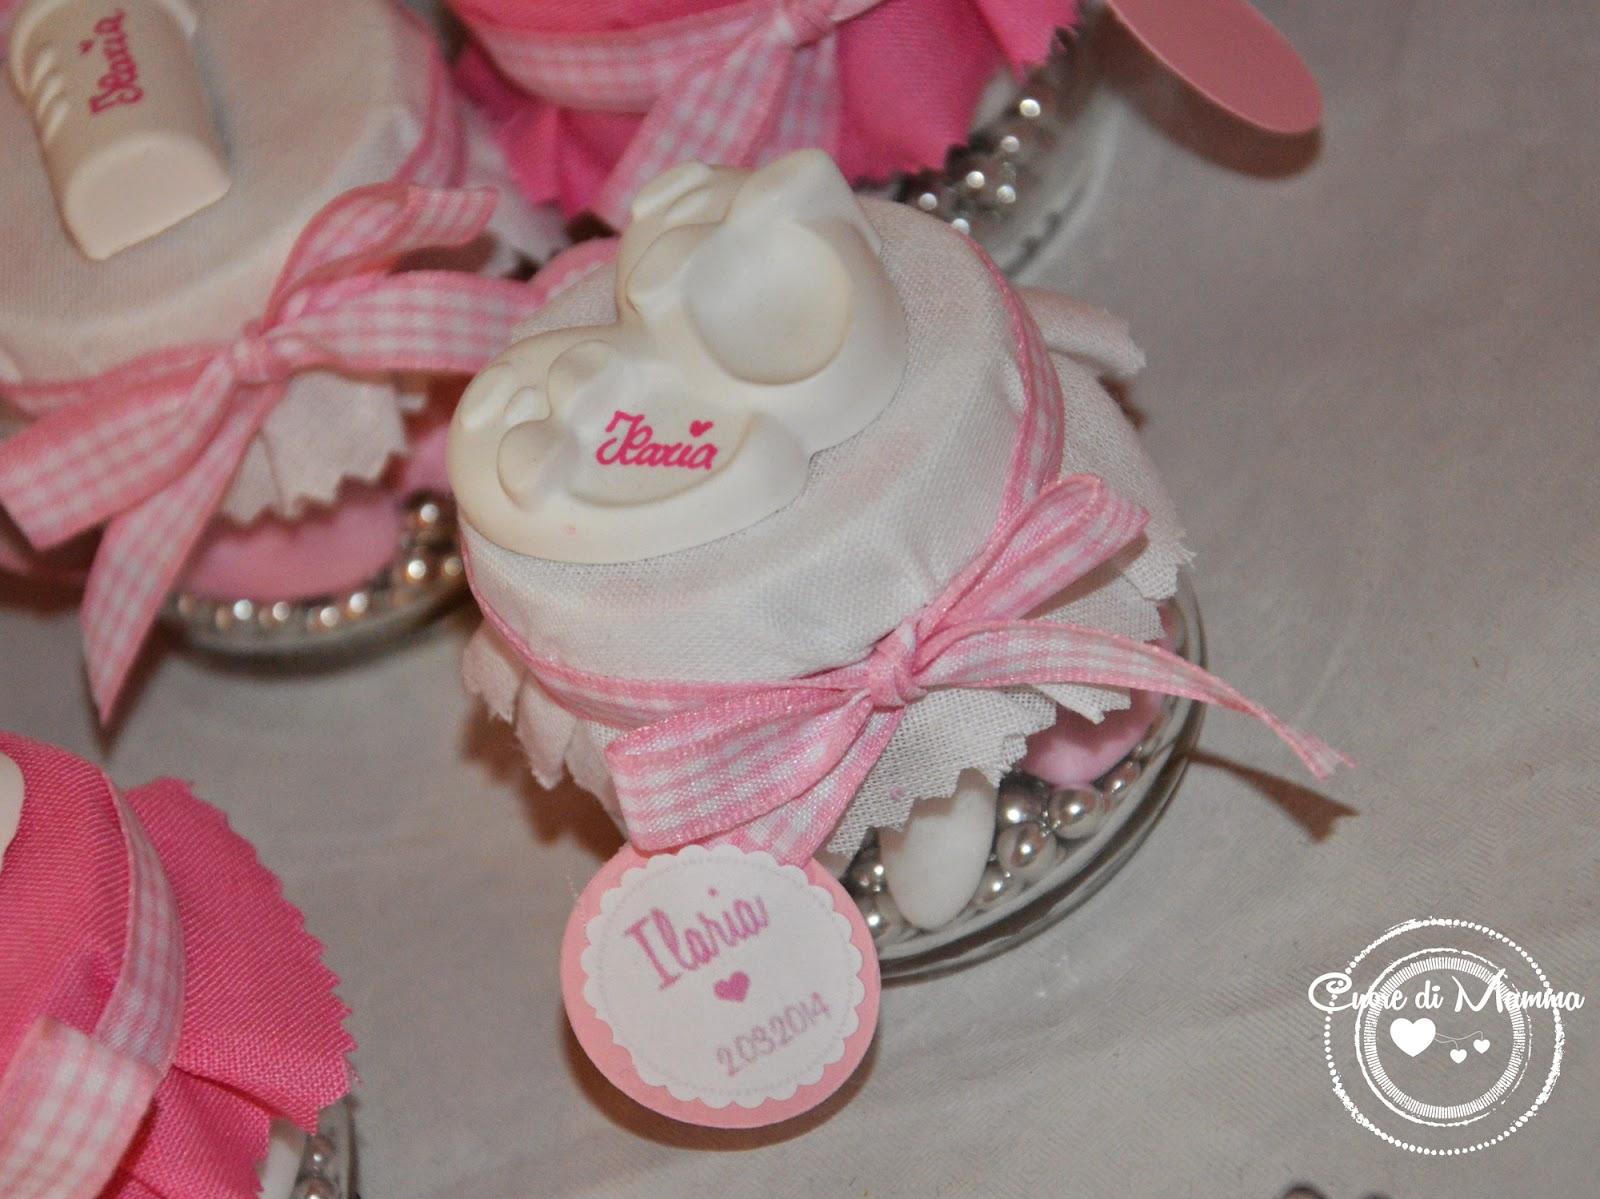 Bien connu Cuore di mamma: Un battesimo in bianco e rosa KH06